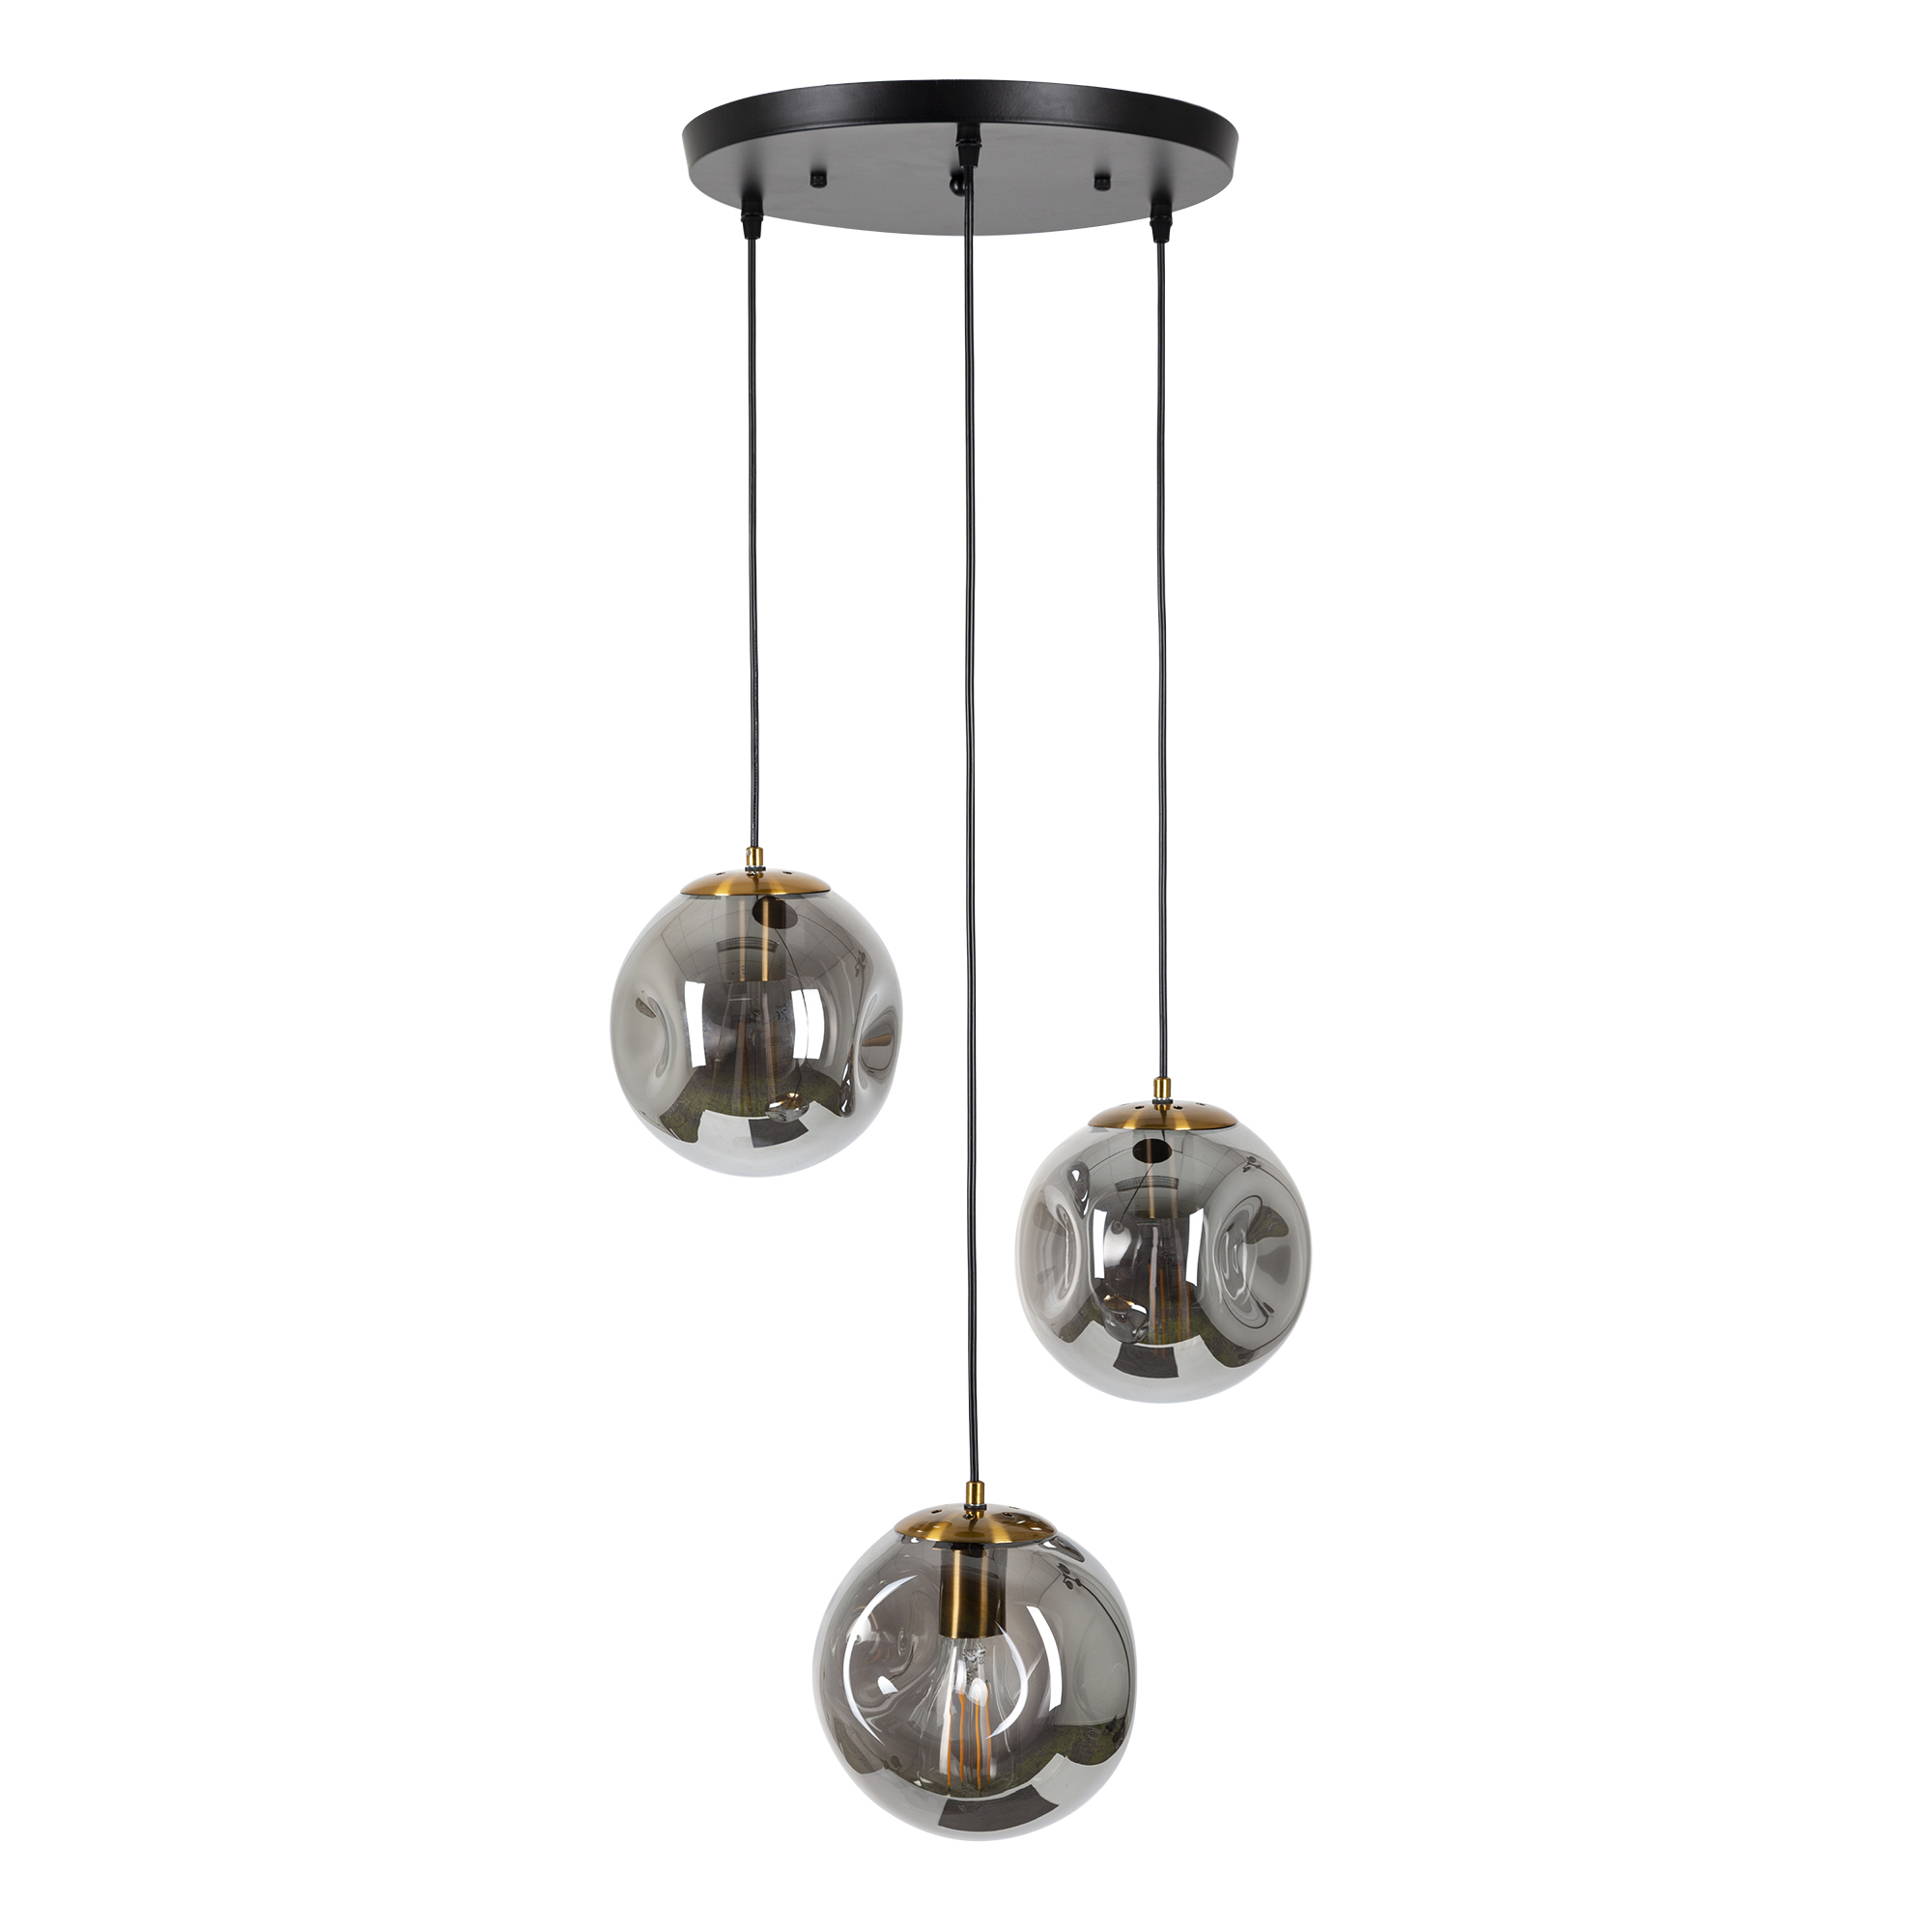 Orbs hanglamp 3-lichts rond